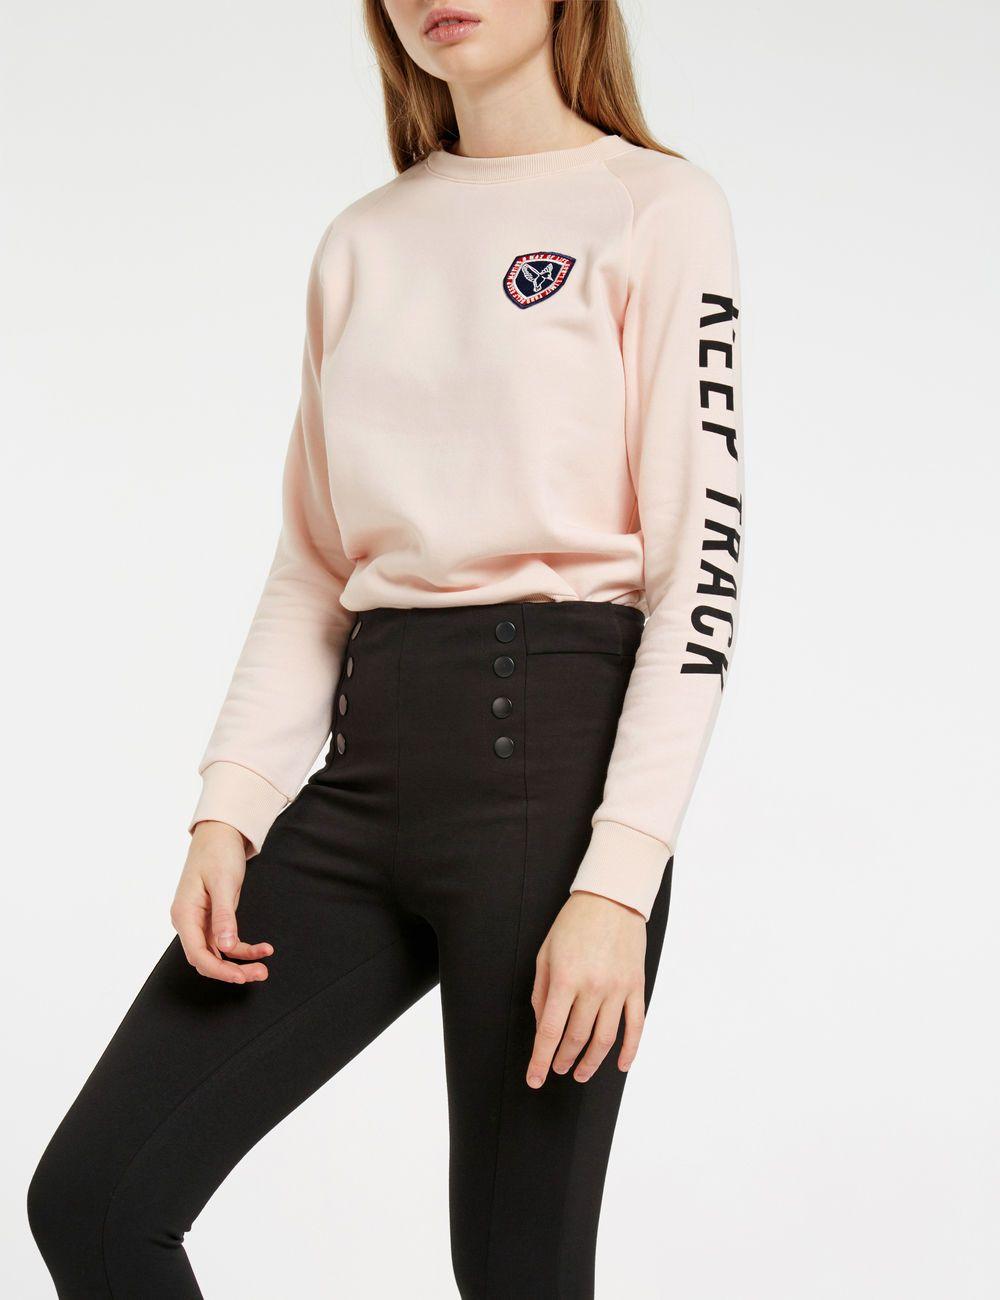 Jennyfer clothing online